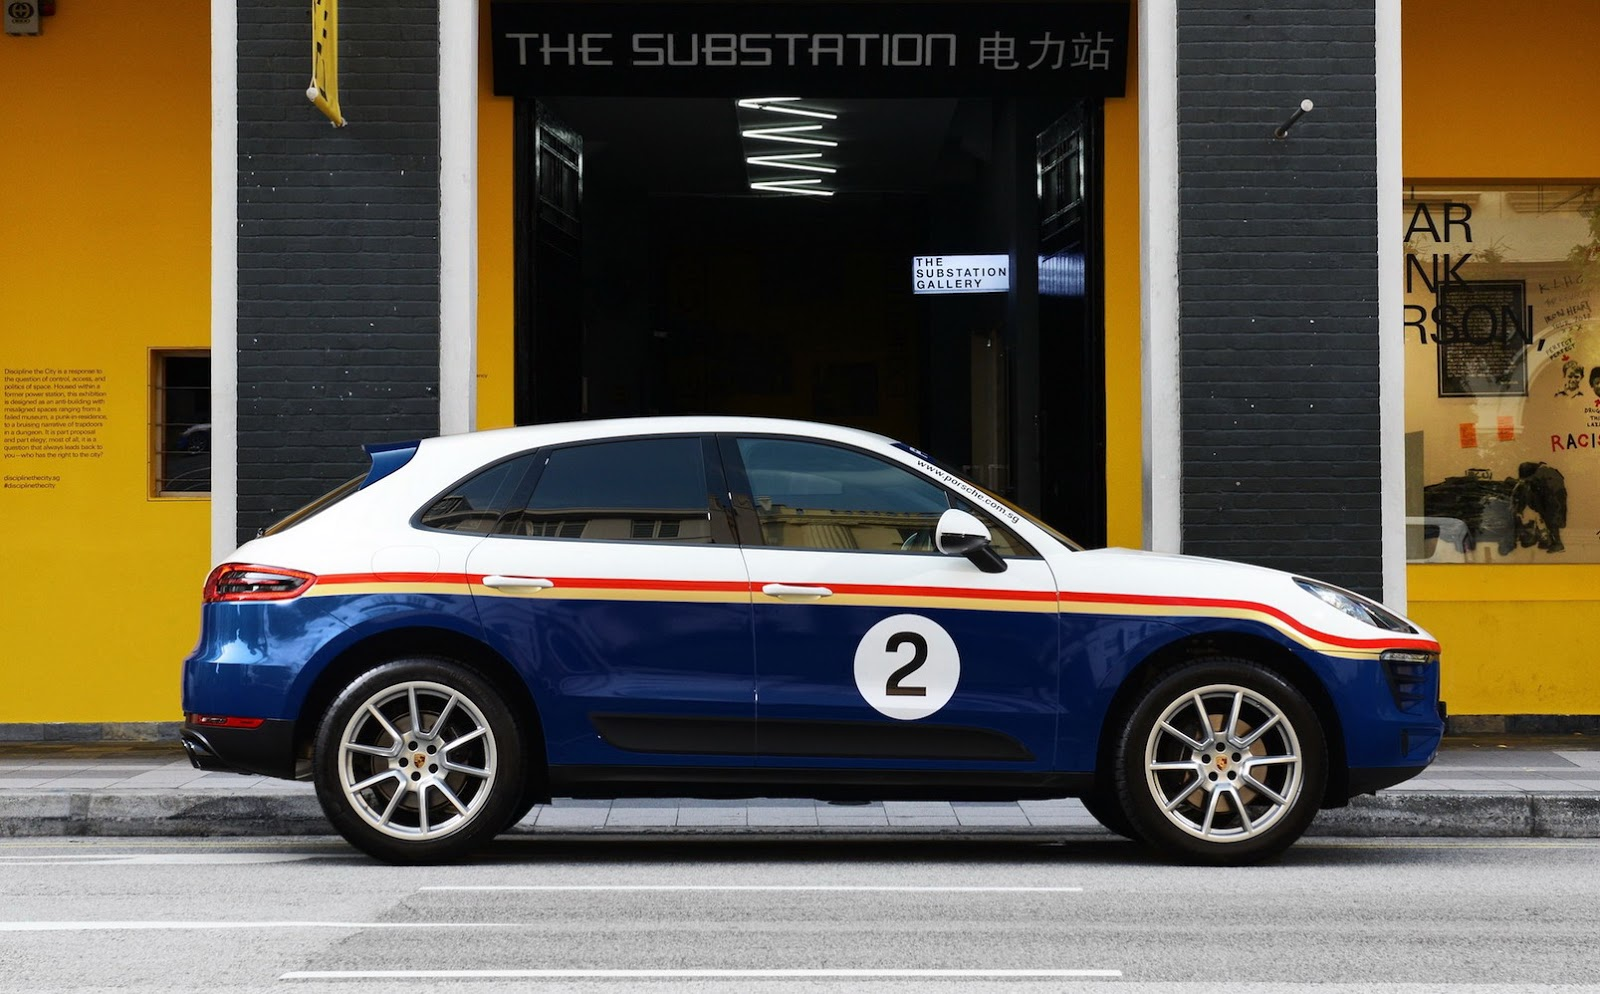 Porsche Macan Classic Racing Liveries (4)